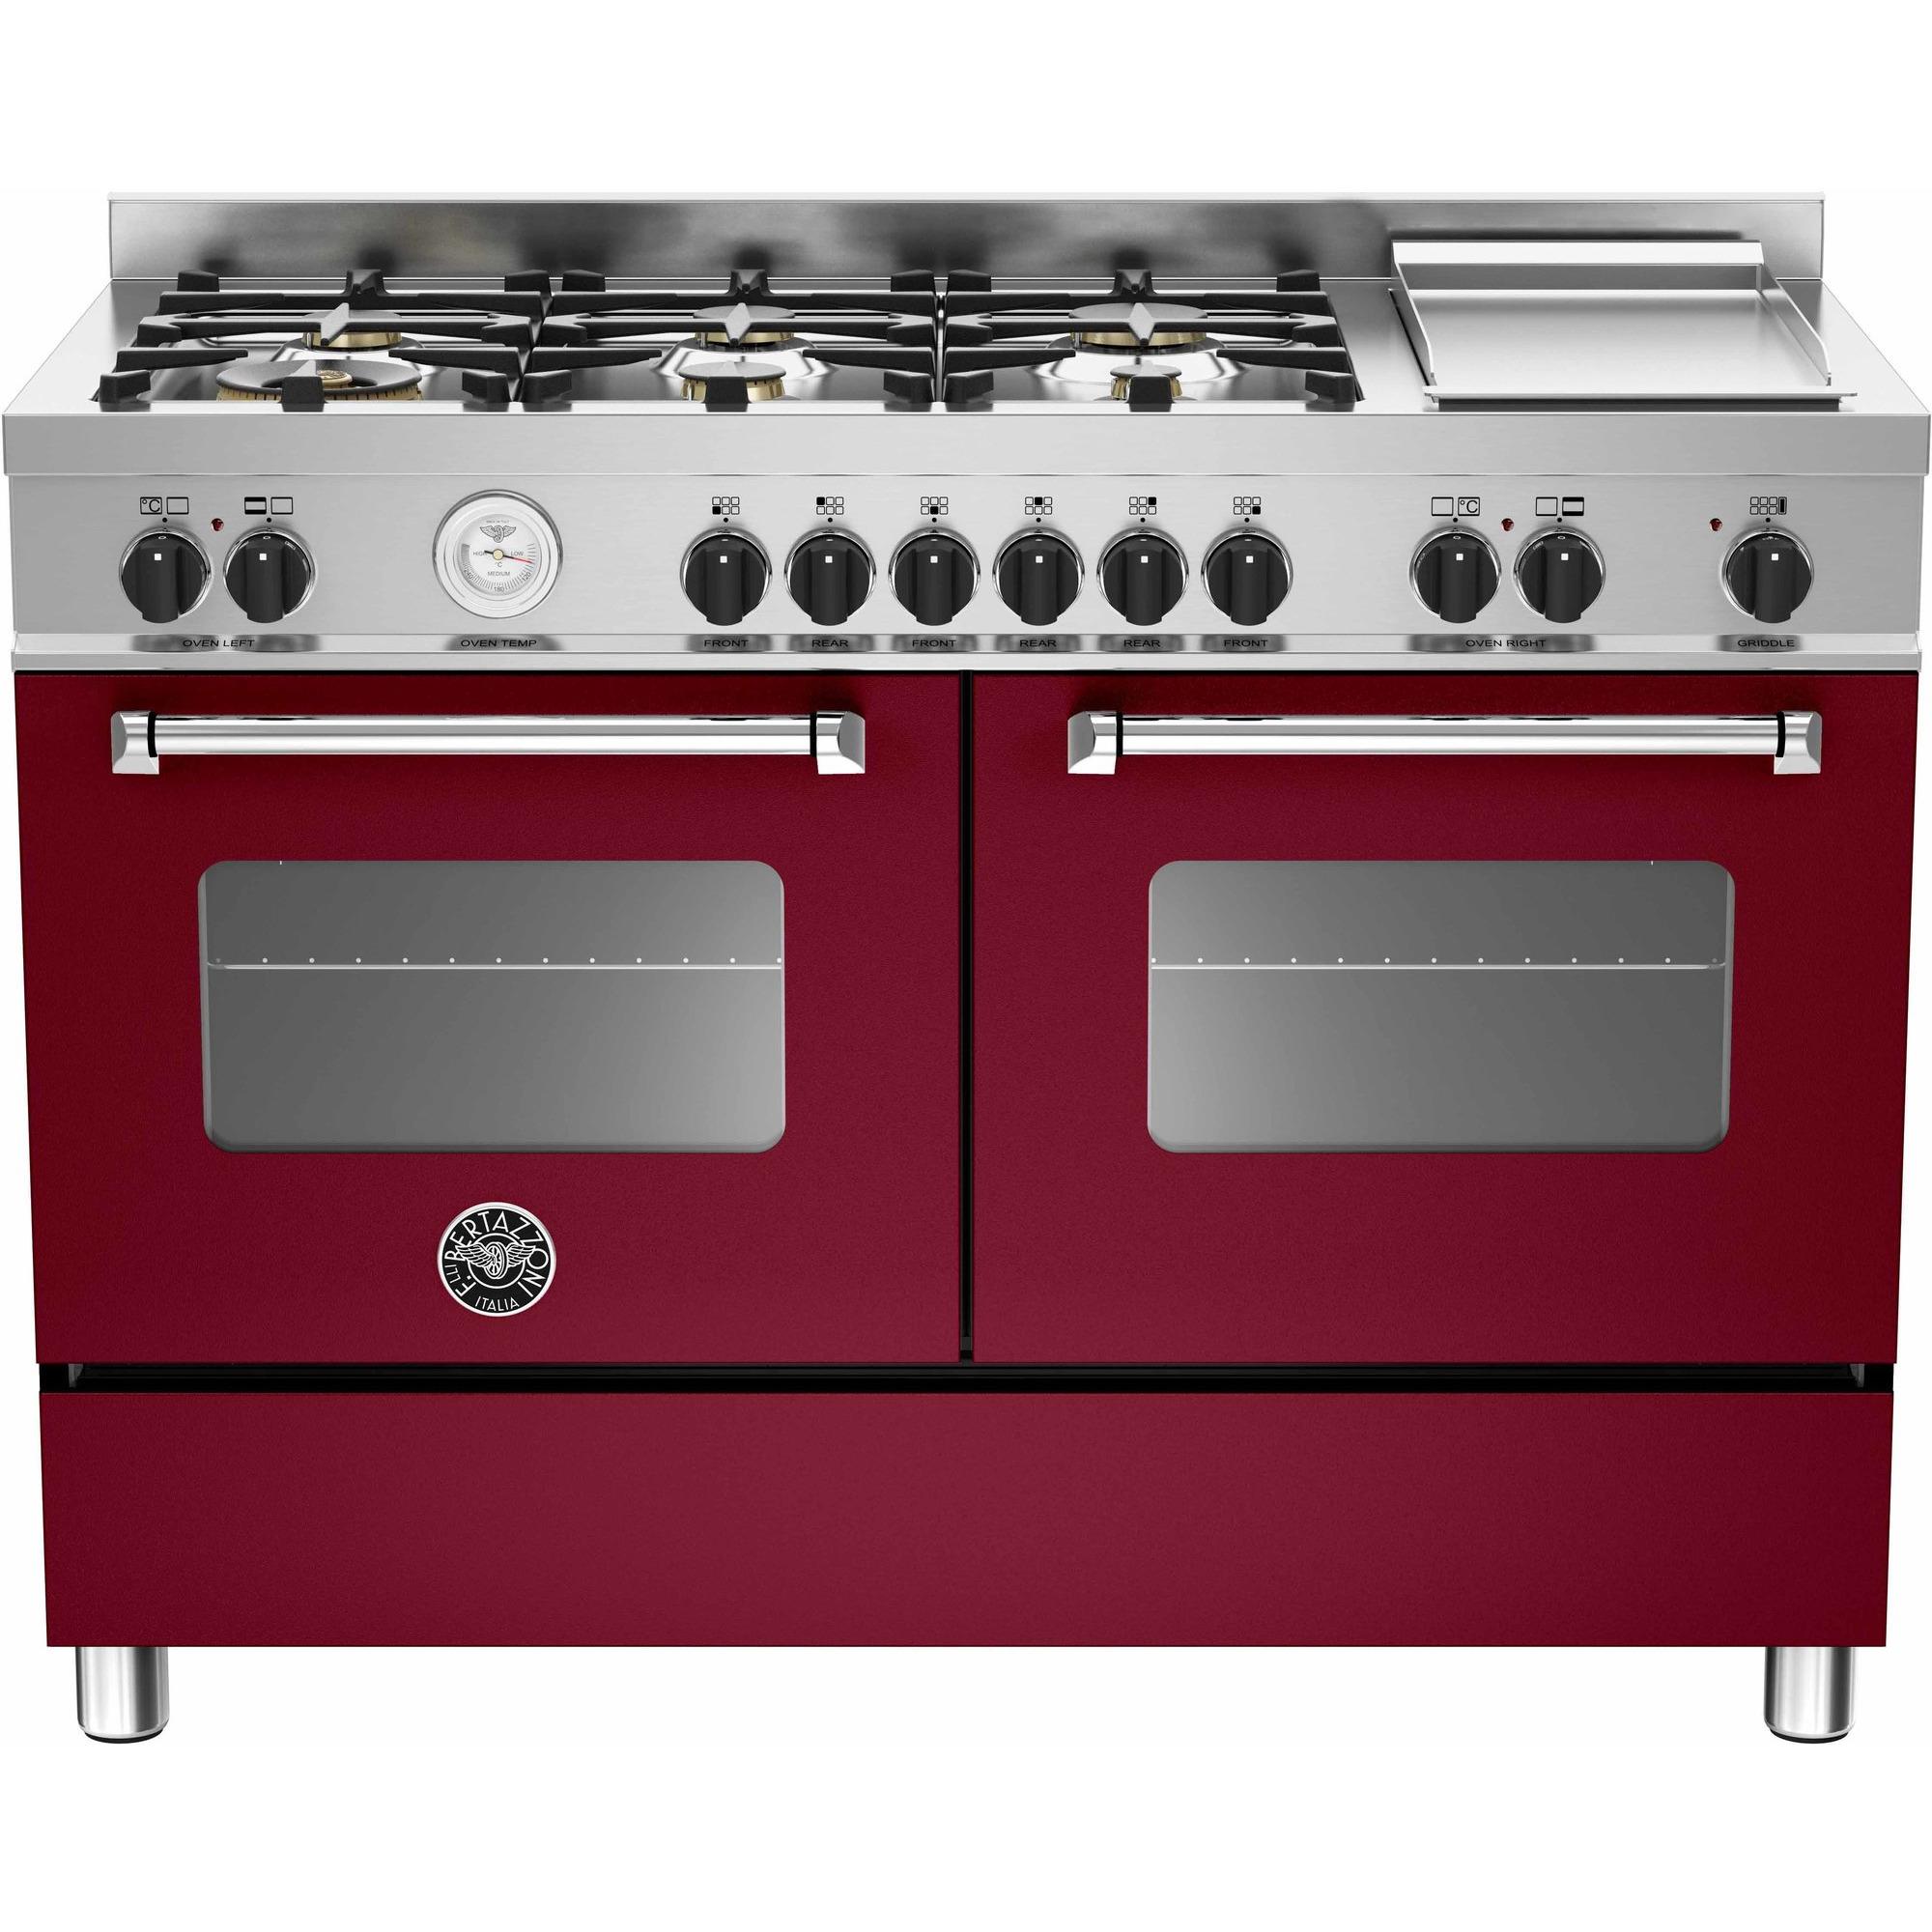 Bertazzoni MAS1206 Gasspis 120 cm 2 ugnar 6 brännare + elektrisk tepanyaki Vinröd